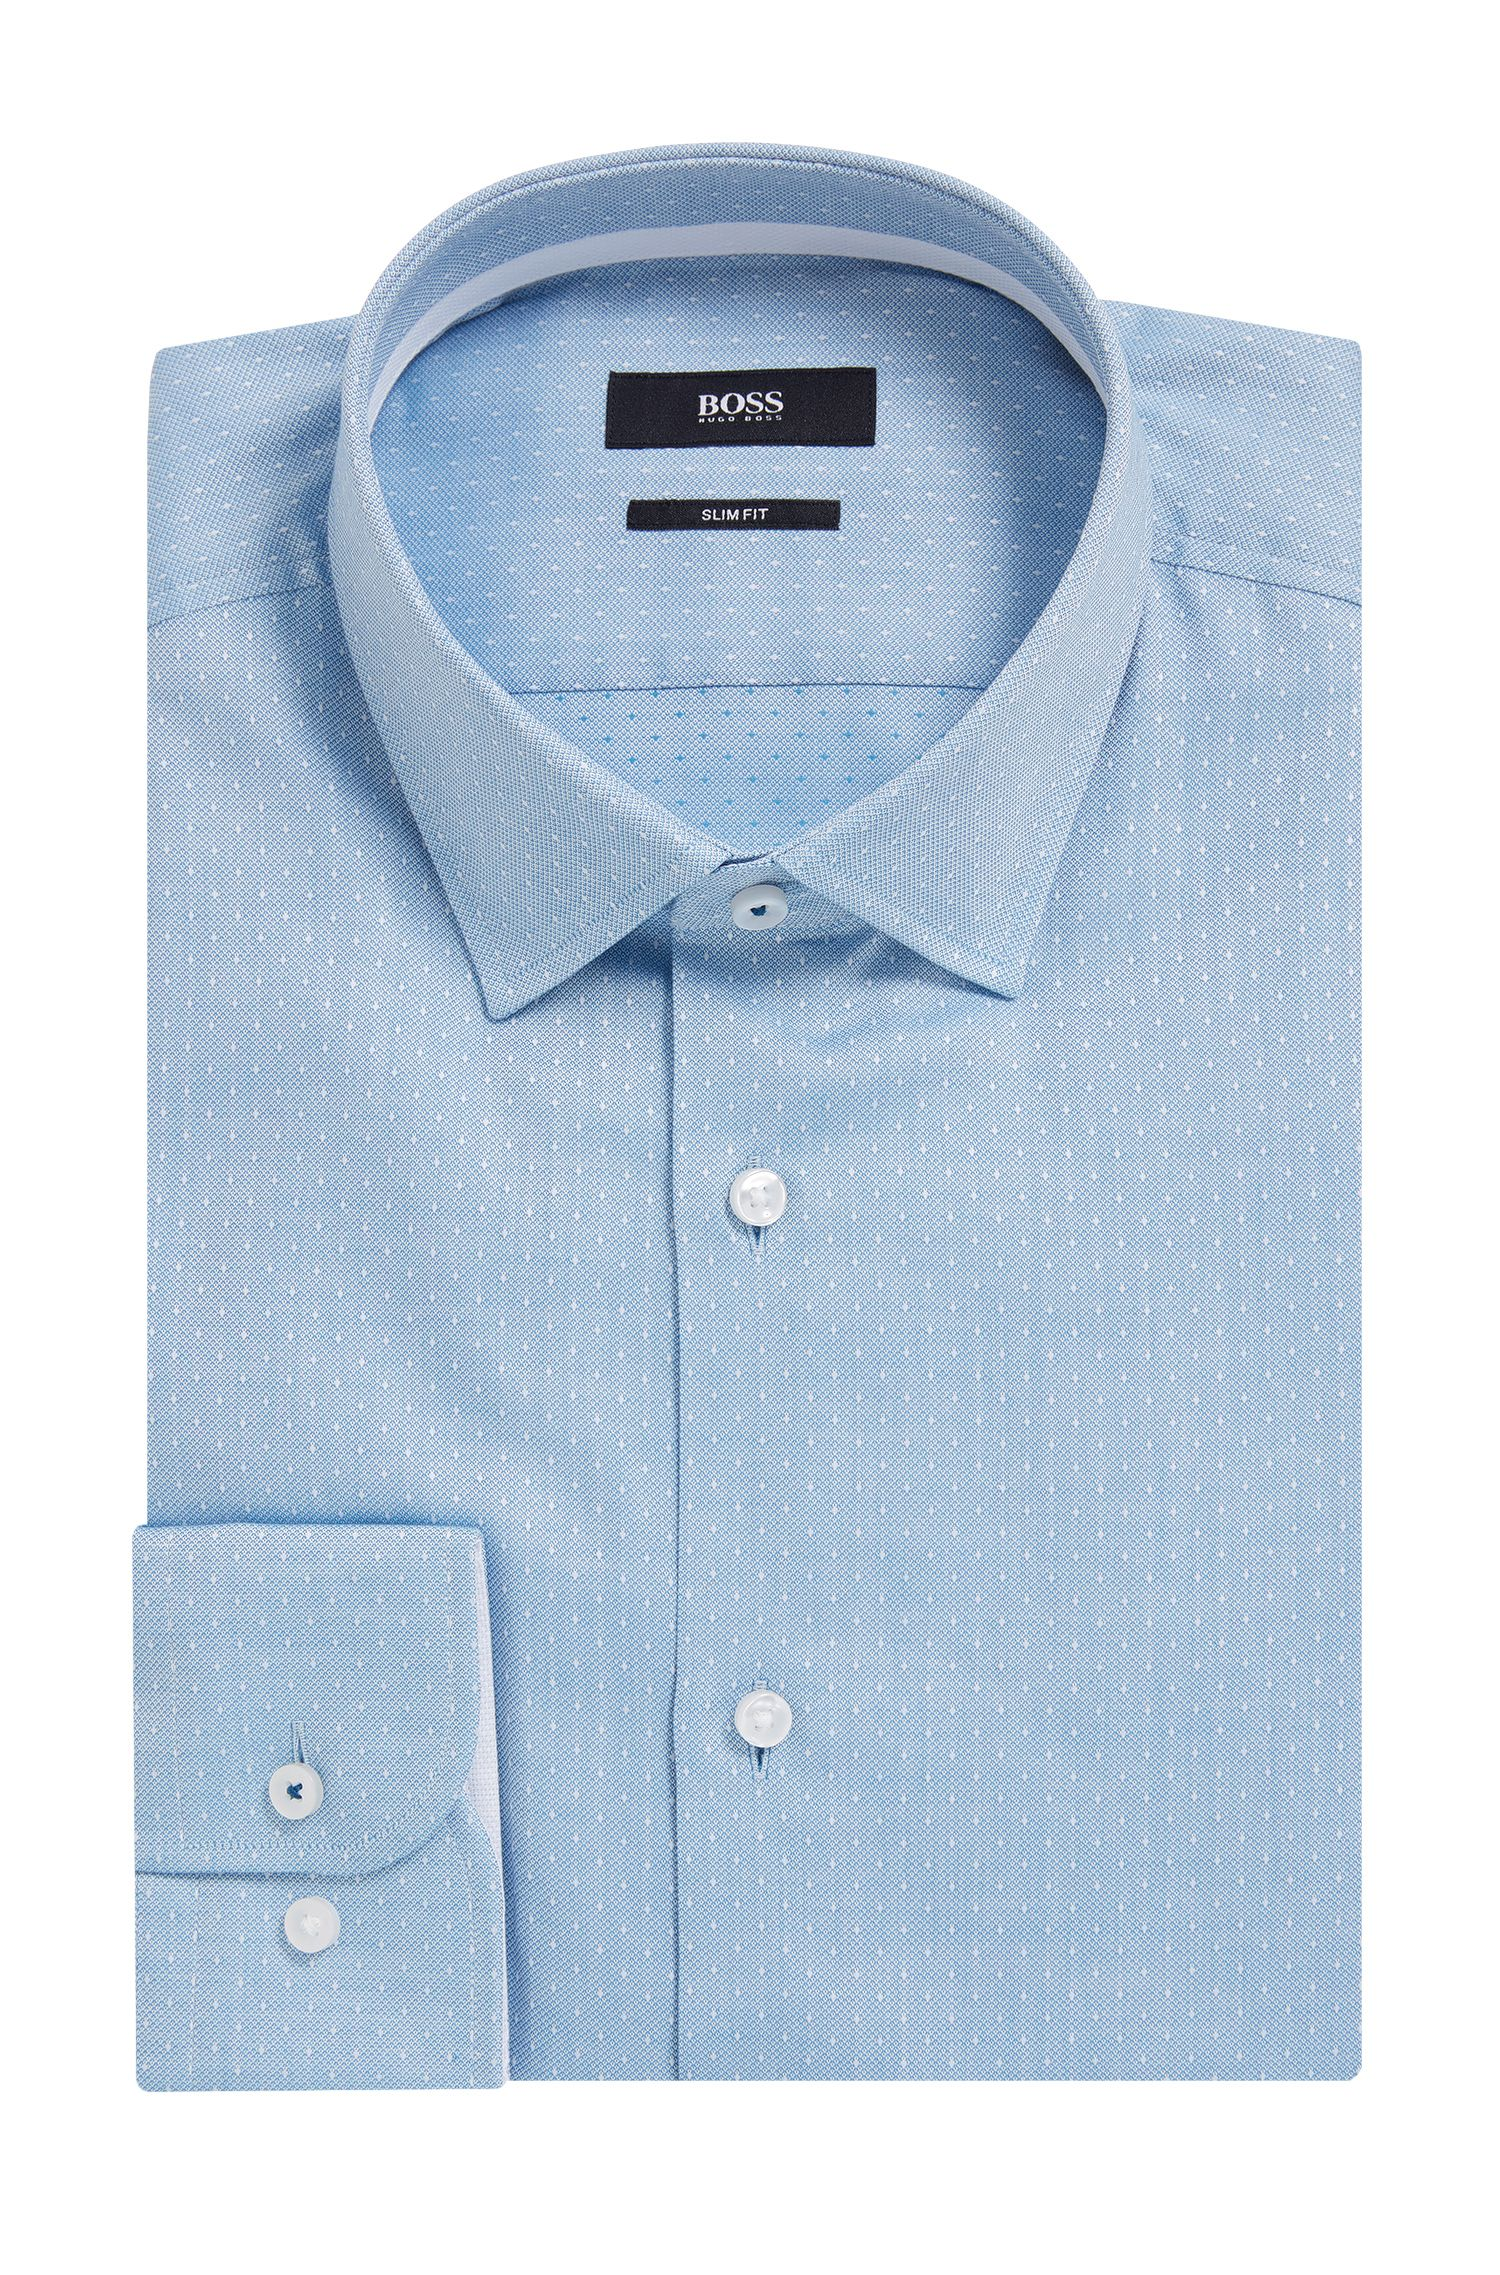 Dot-Print Cotton Dress Shirt, Slim Fit | Jesse